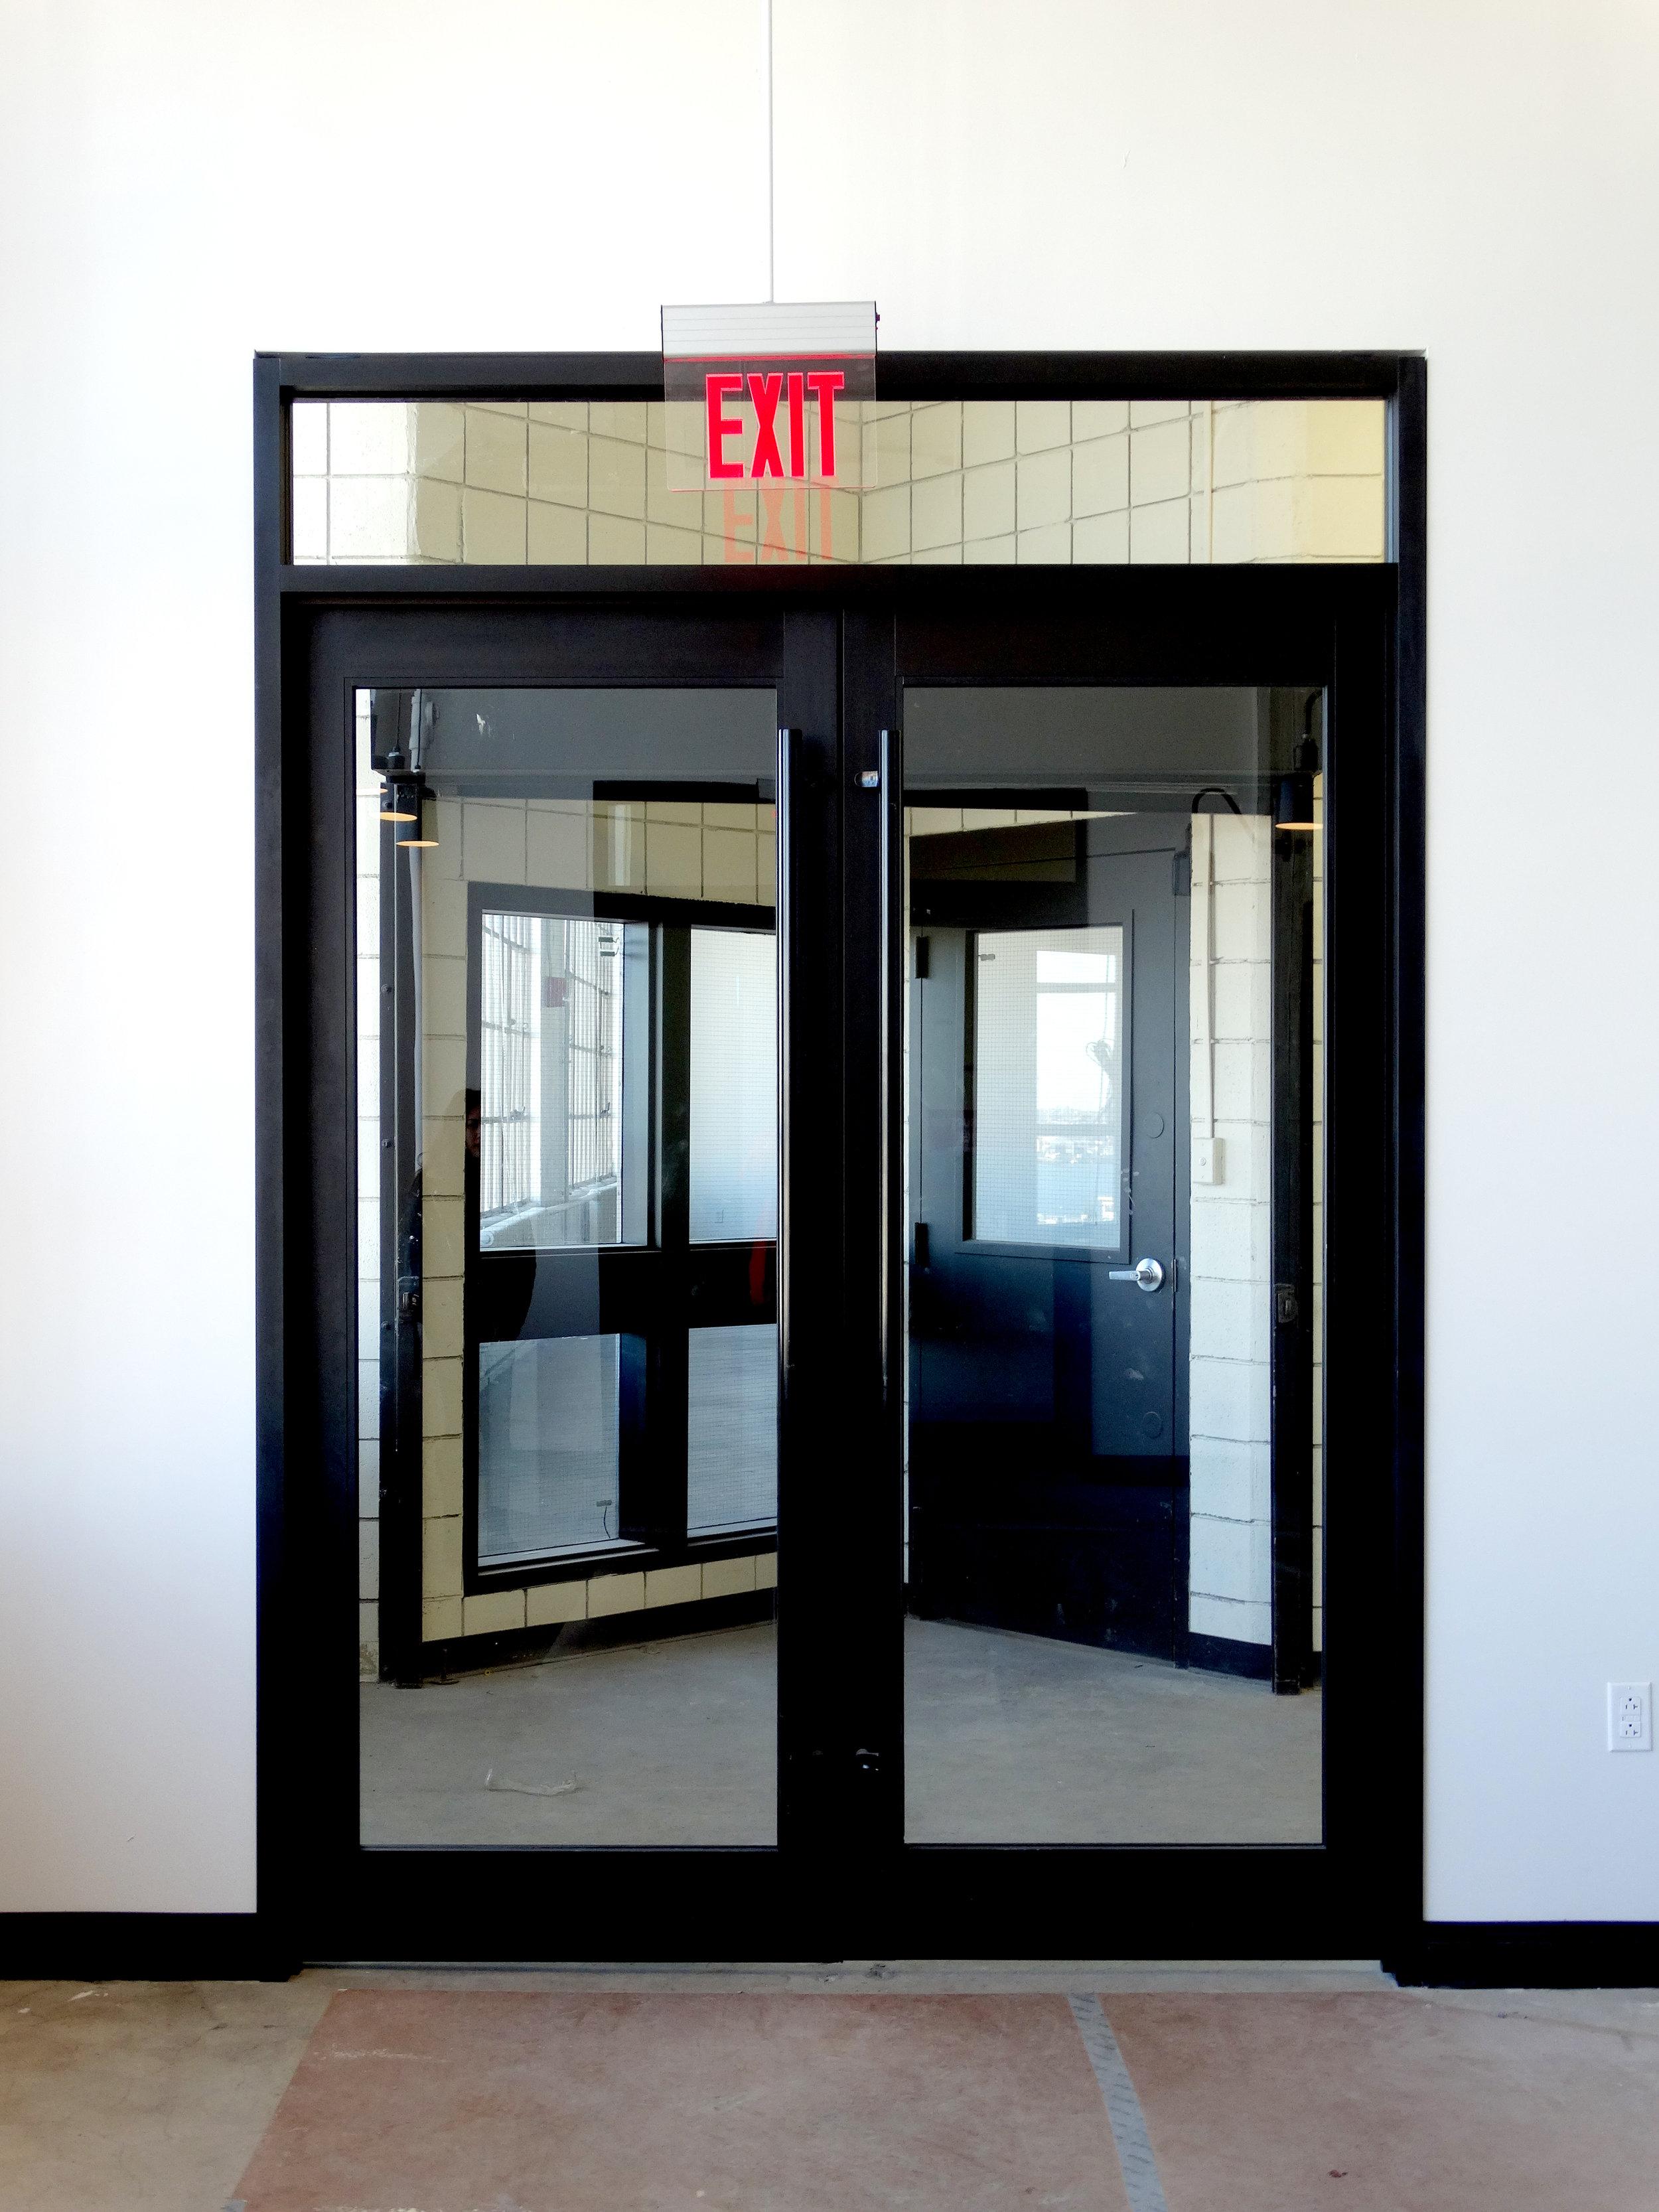 Encase Black Aluminum Elevator Lobby Doors - Spaceworks AI.jpg